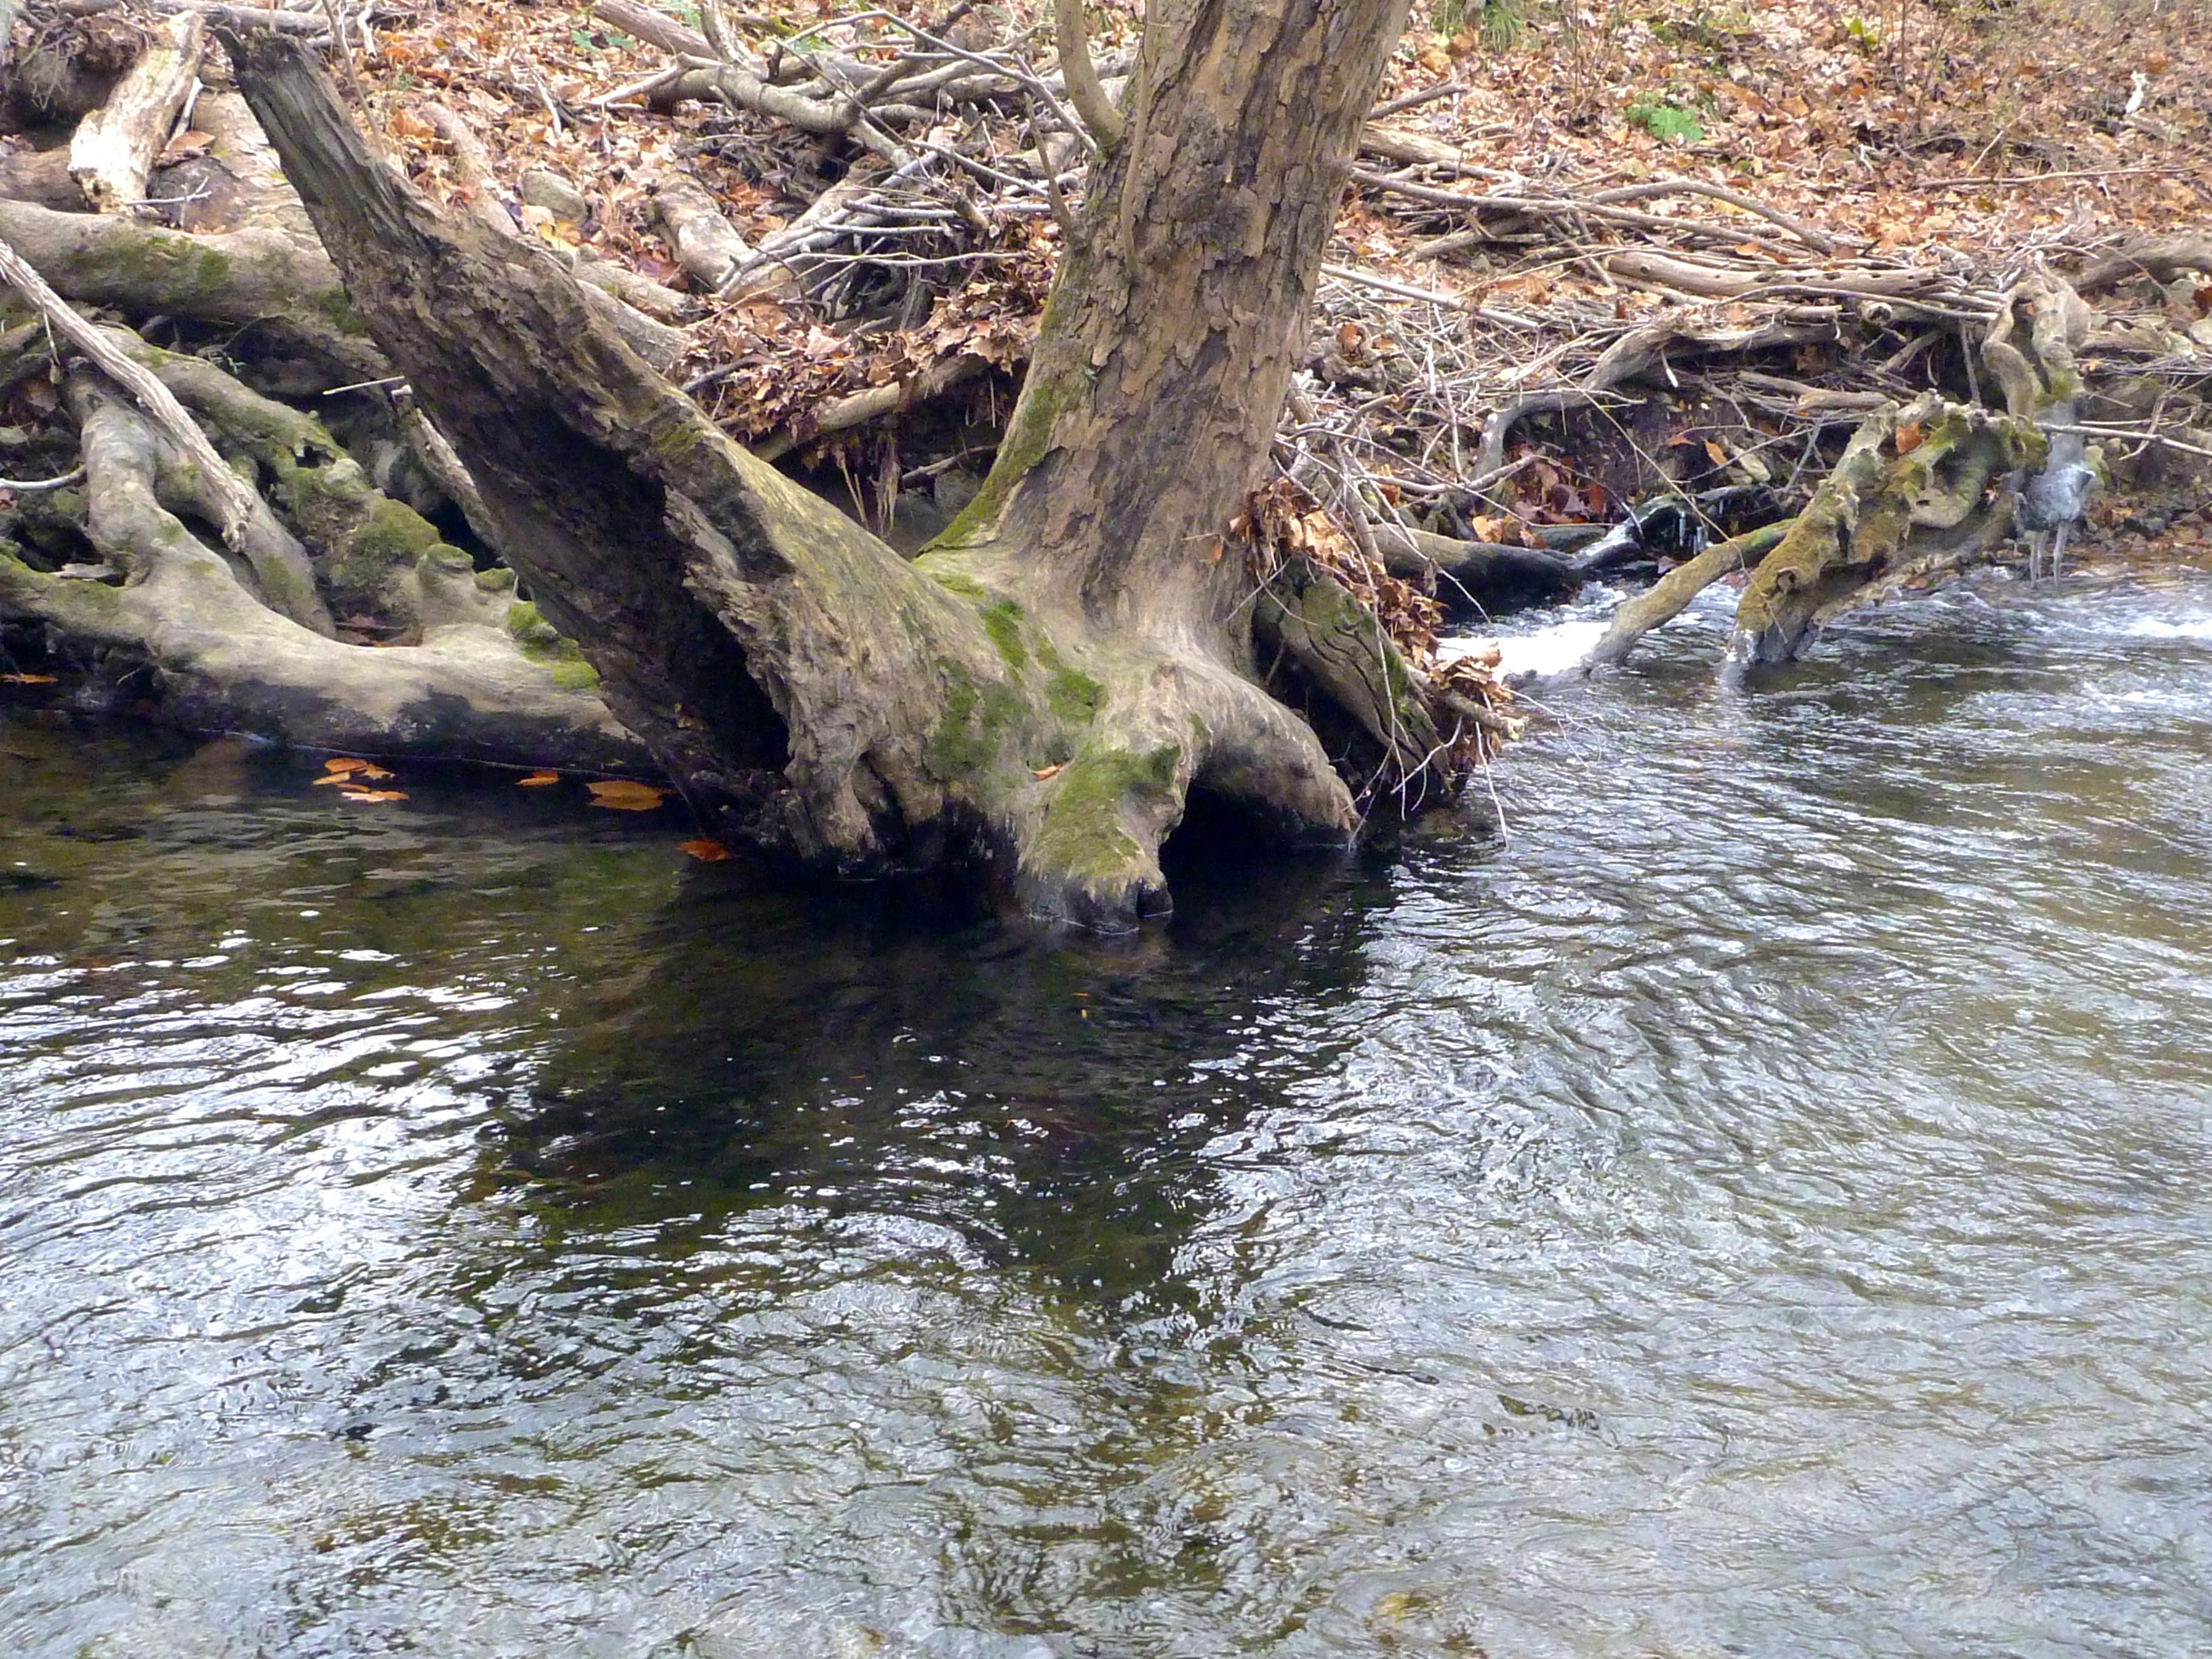 Deep pool around roots